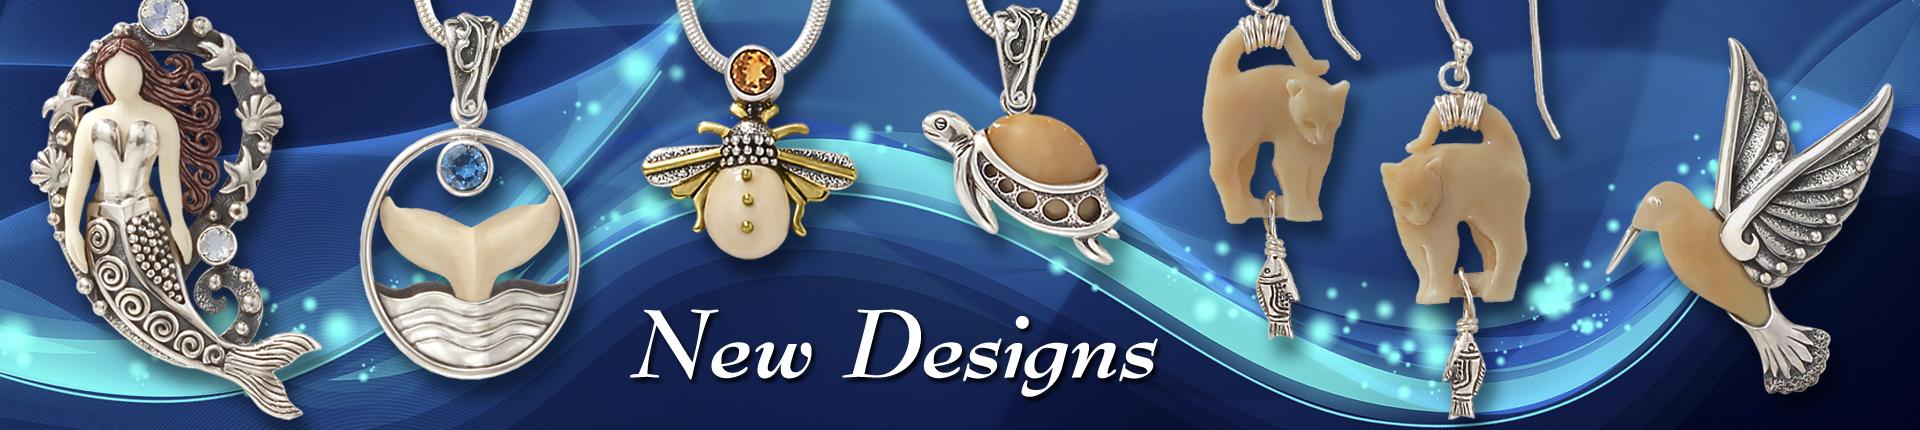 New Designs 2018